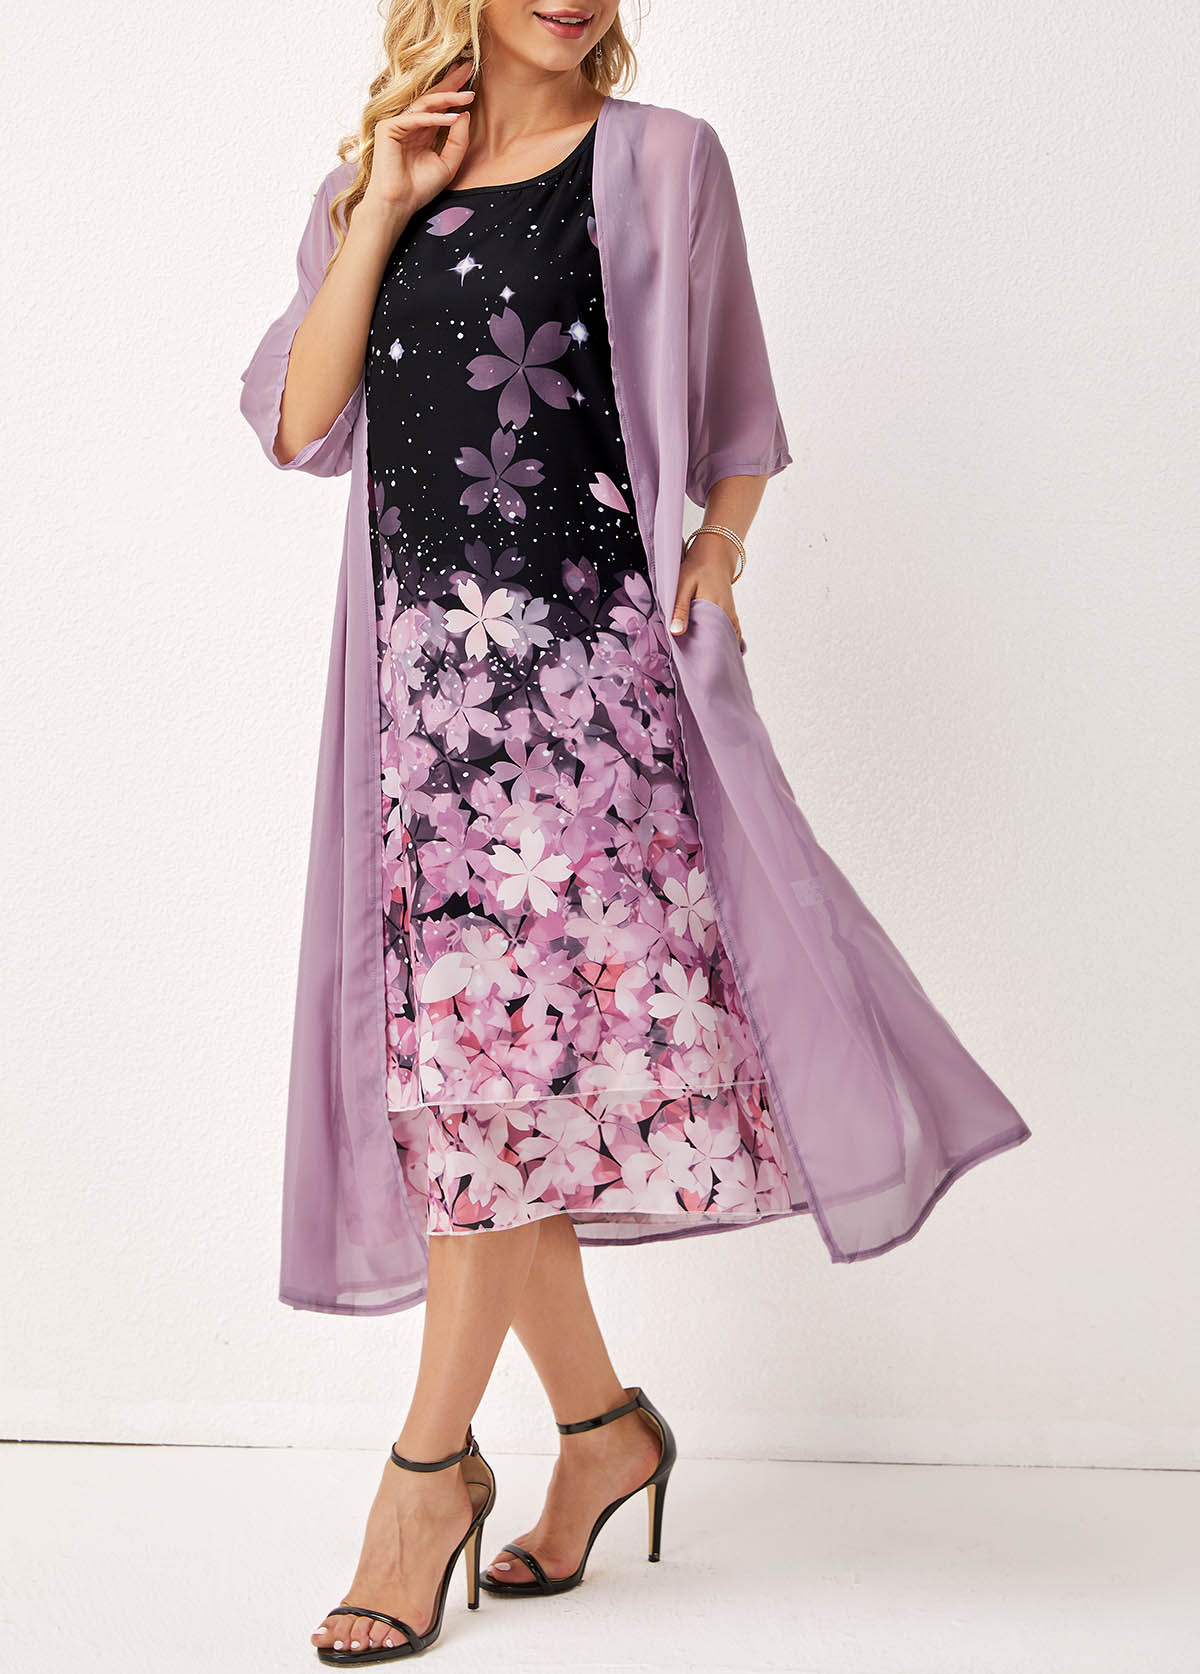 Layered Floral Print Three Quarters Sleeve Round Neck Dress